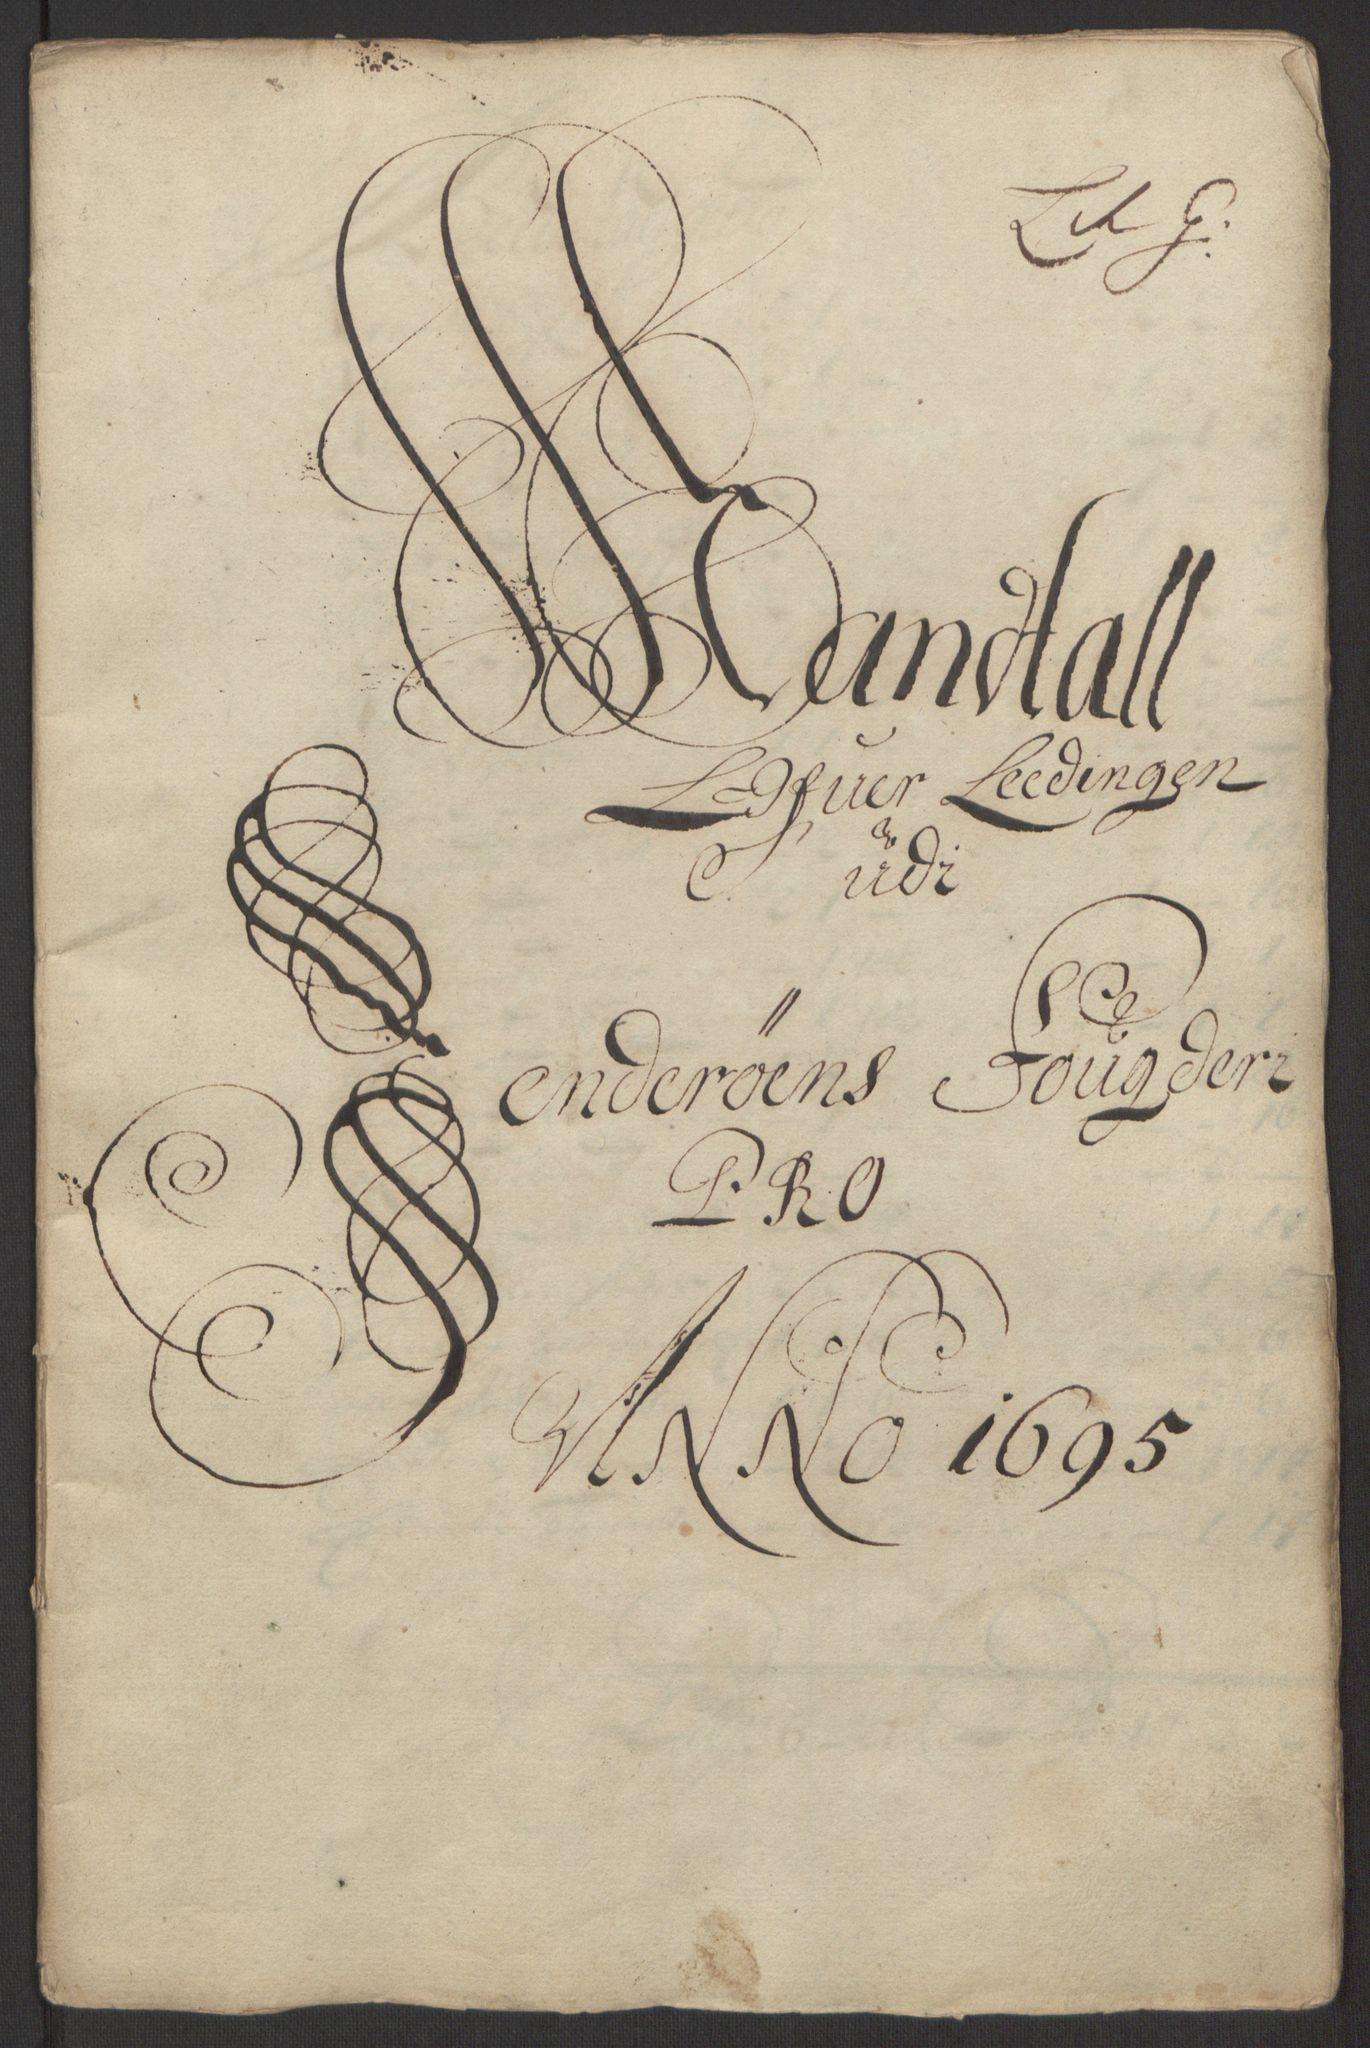 RA, Rentekammeret inntil 1814, Reviderte regnskaper, Fogderegnskap, R63/L4309: Fogderegnskap Inderøy, 1695-1697, s. 55